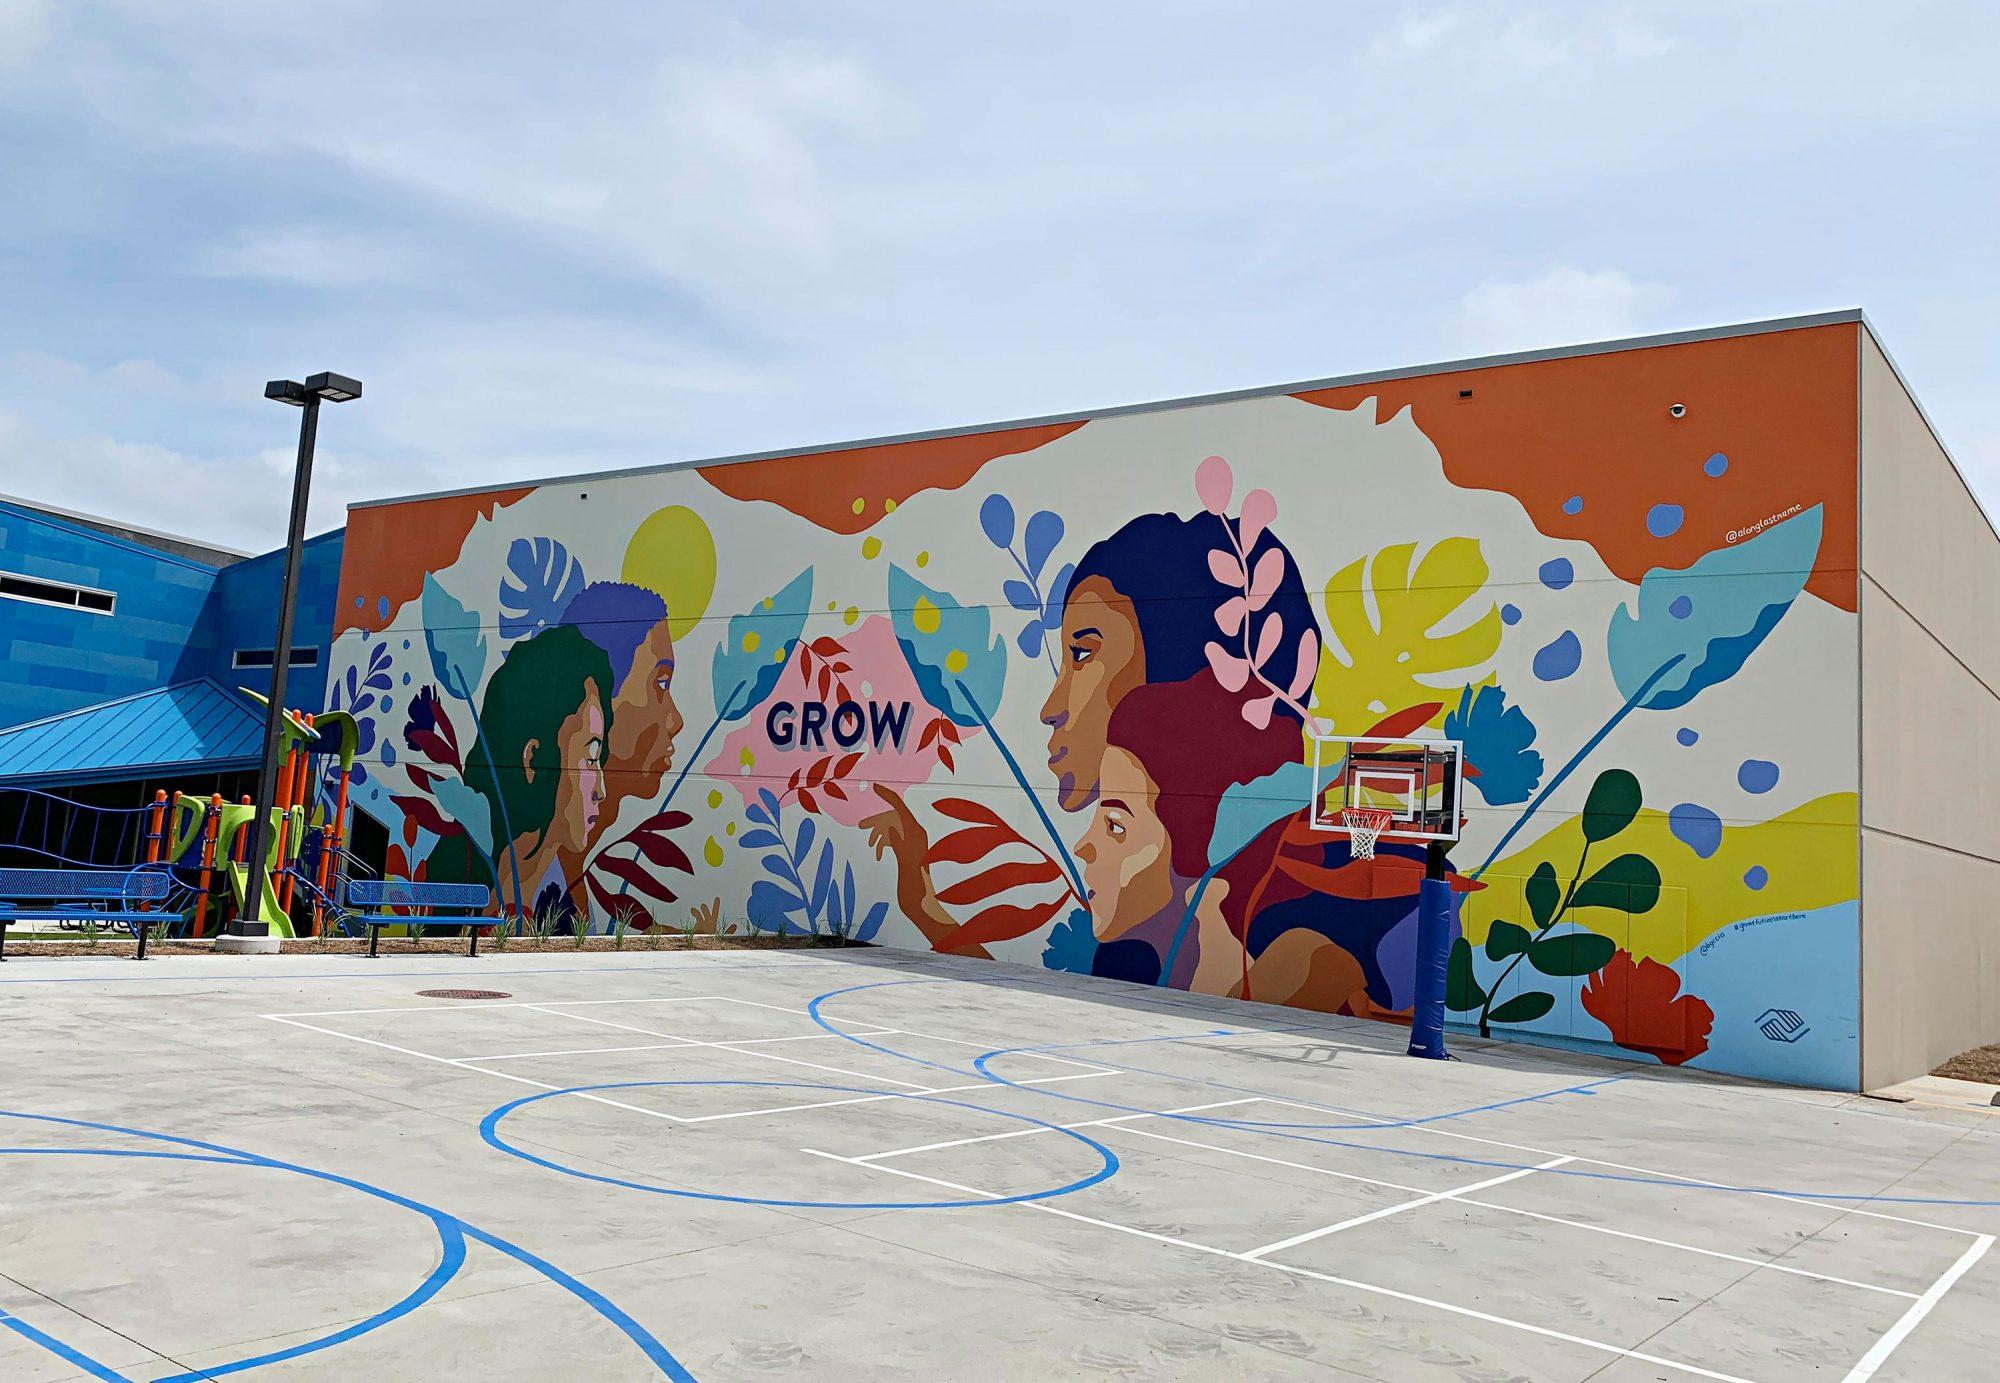 Amanda Phingbodhipakkiya mural project